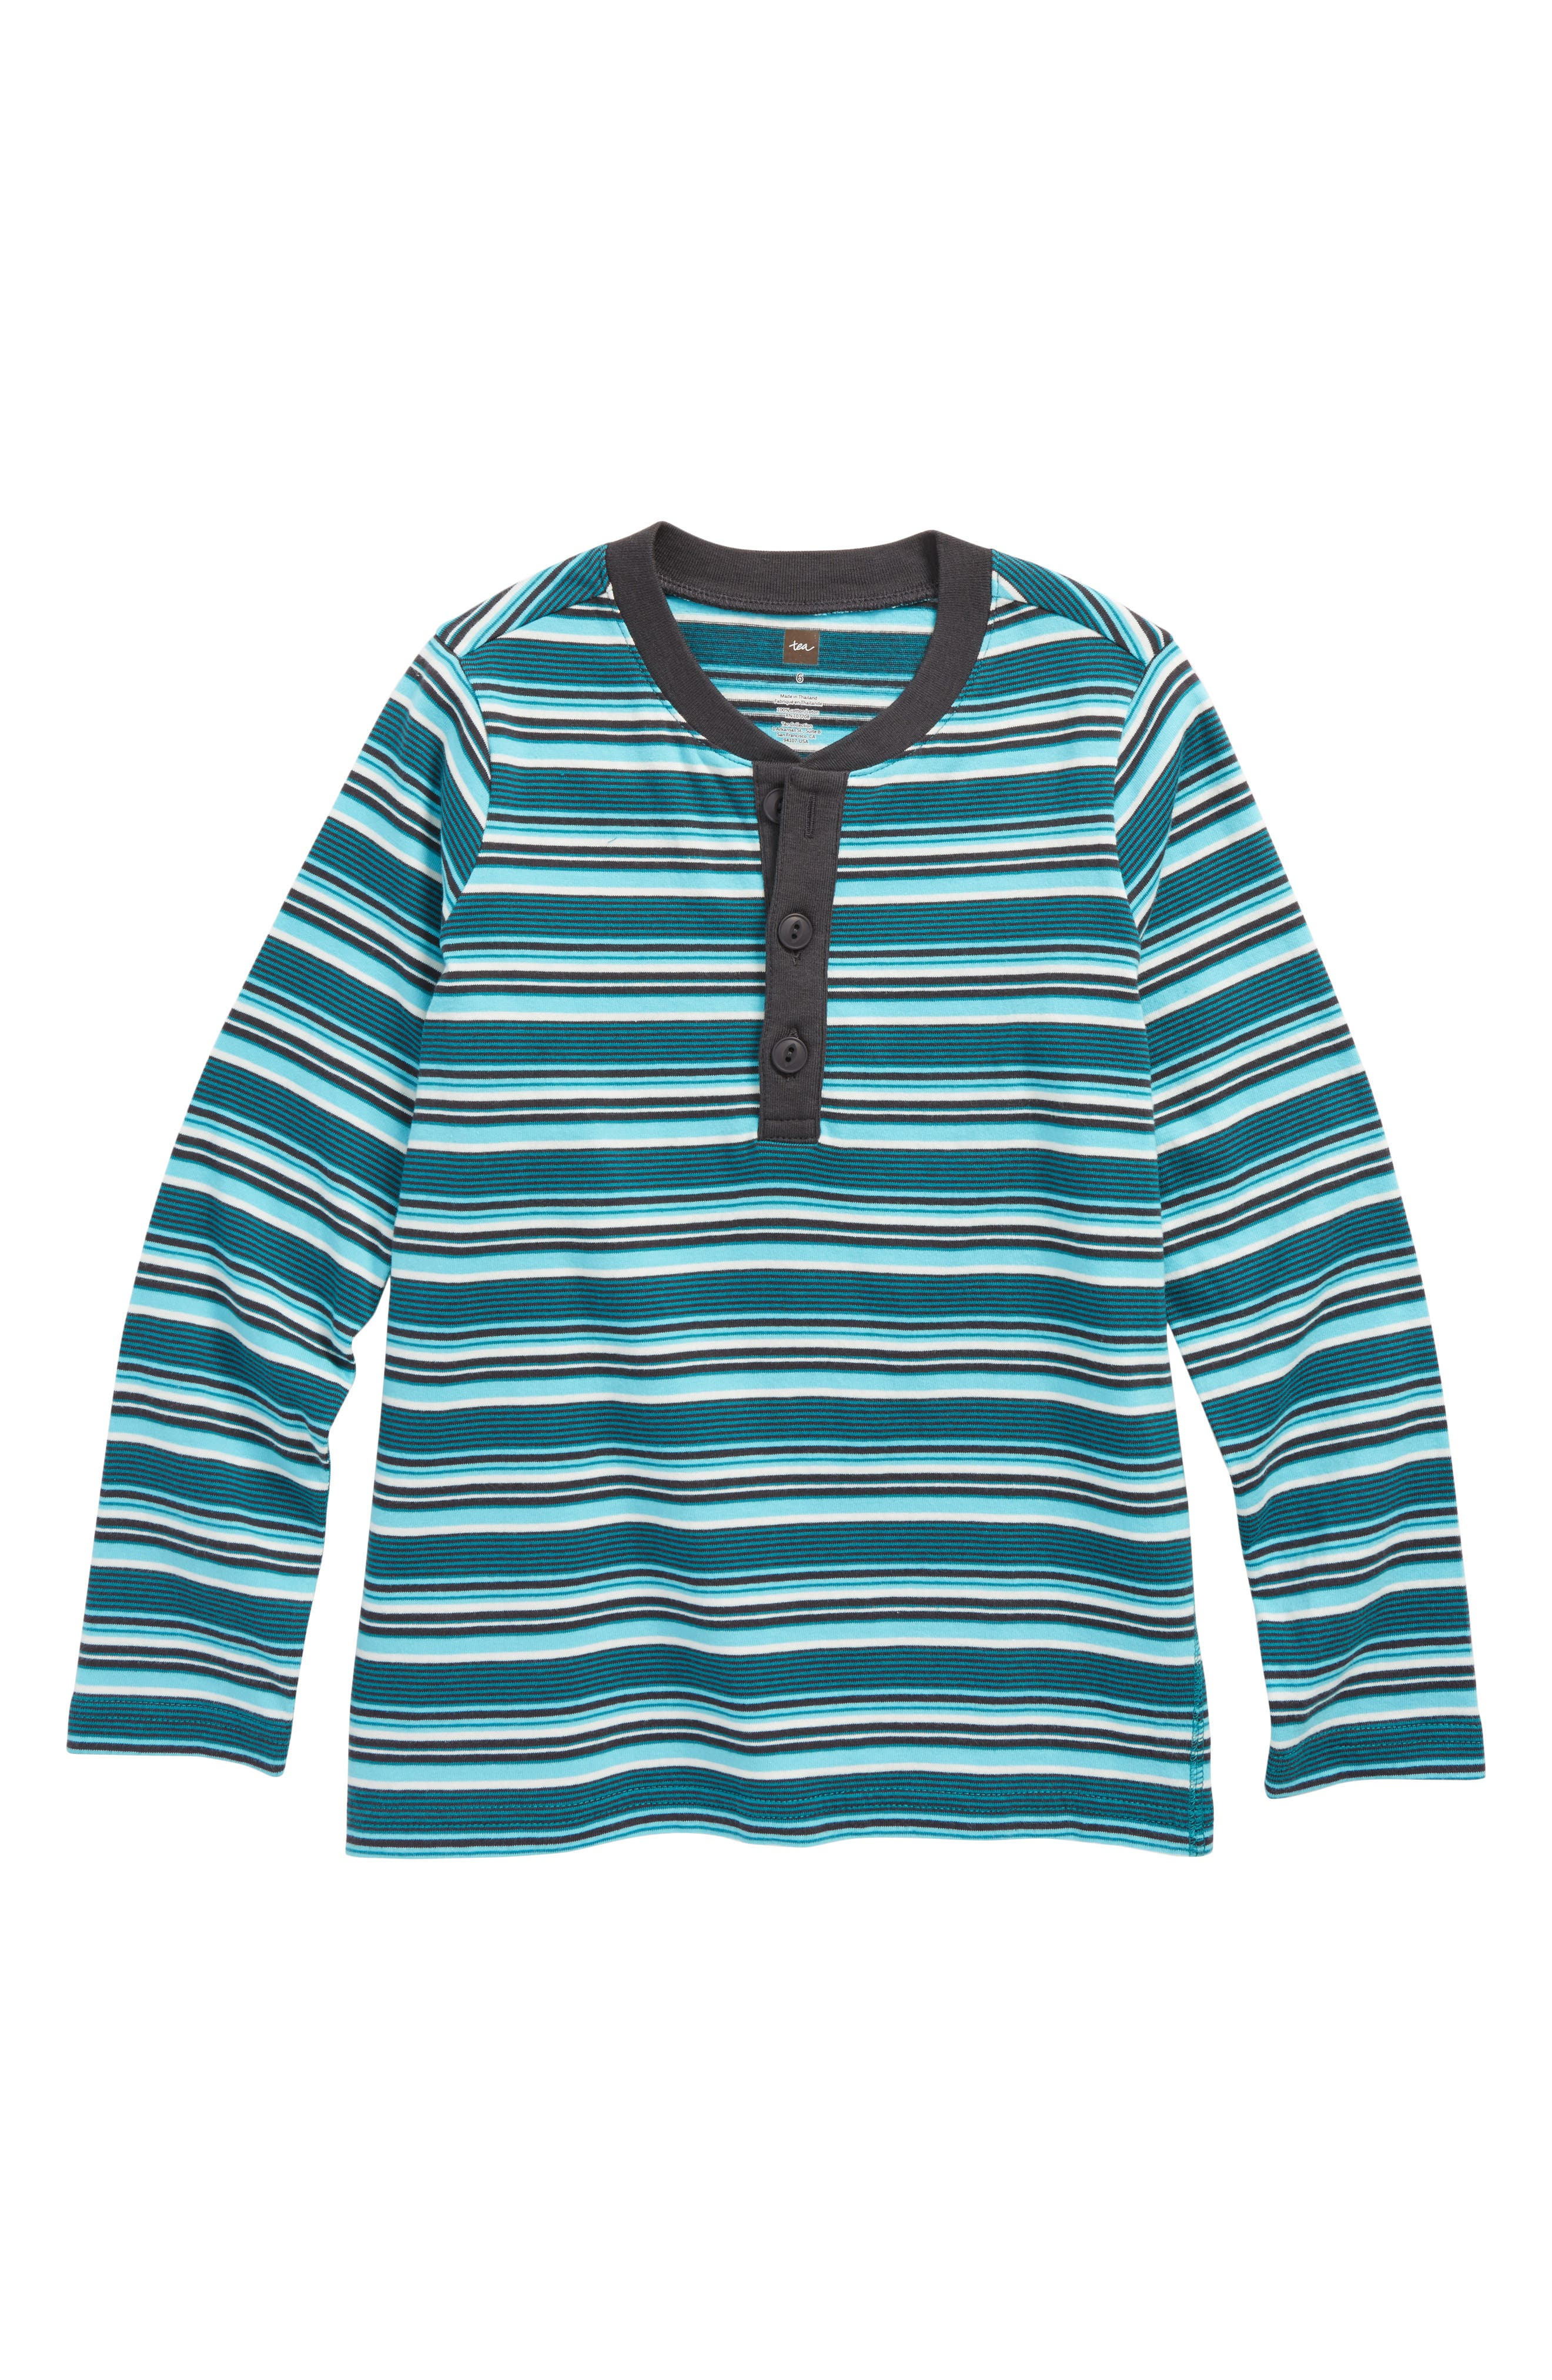 Tea Collection Ugie Stripe Henley T-Shirt (Toddler Boys & Little Boys)